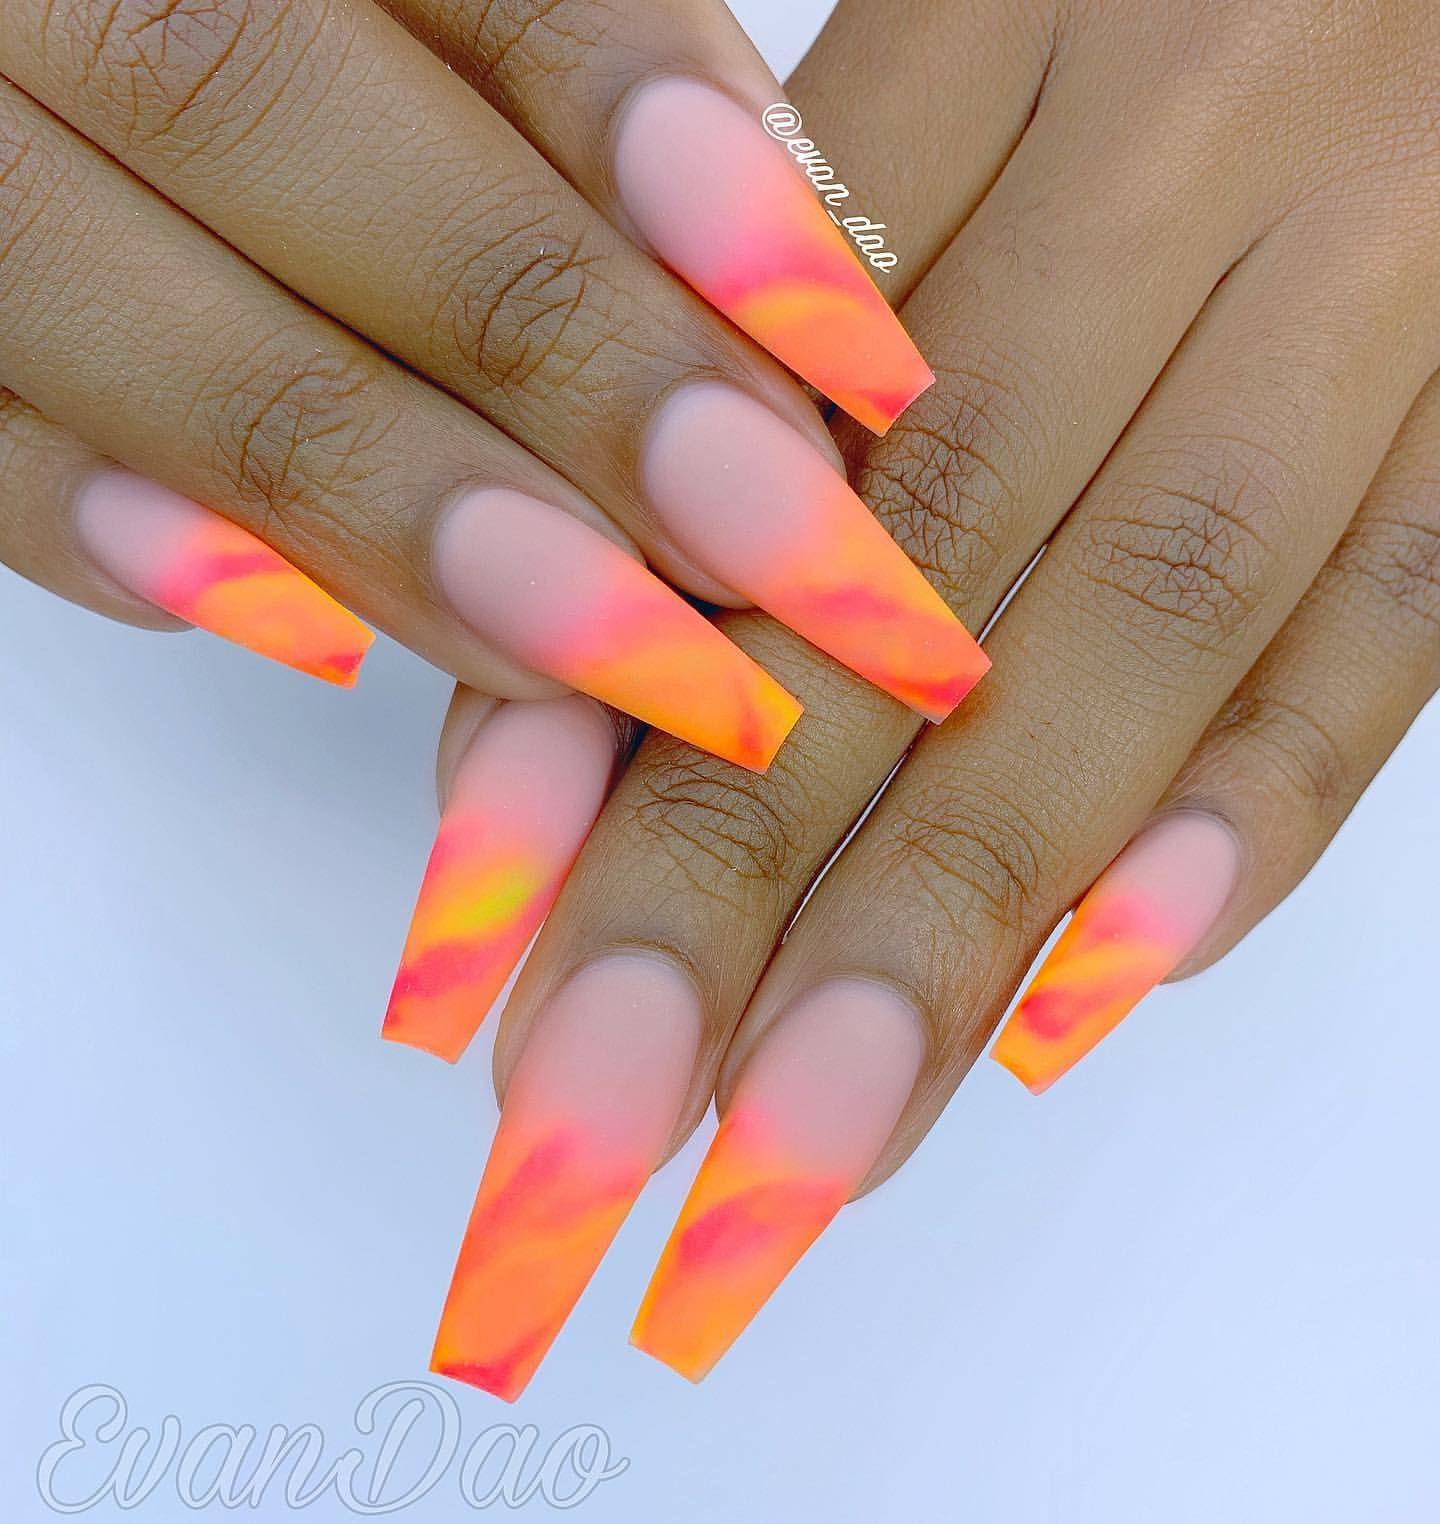 40 Beautiful Coffin Nail Designs 2020 In 2020 Orange Ombre Nails Coffin Nails Designs Orange Nail Designs